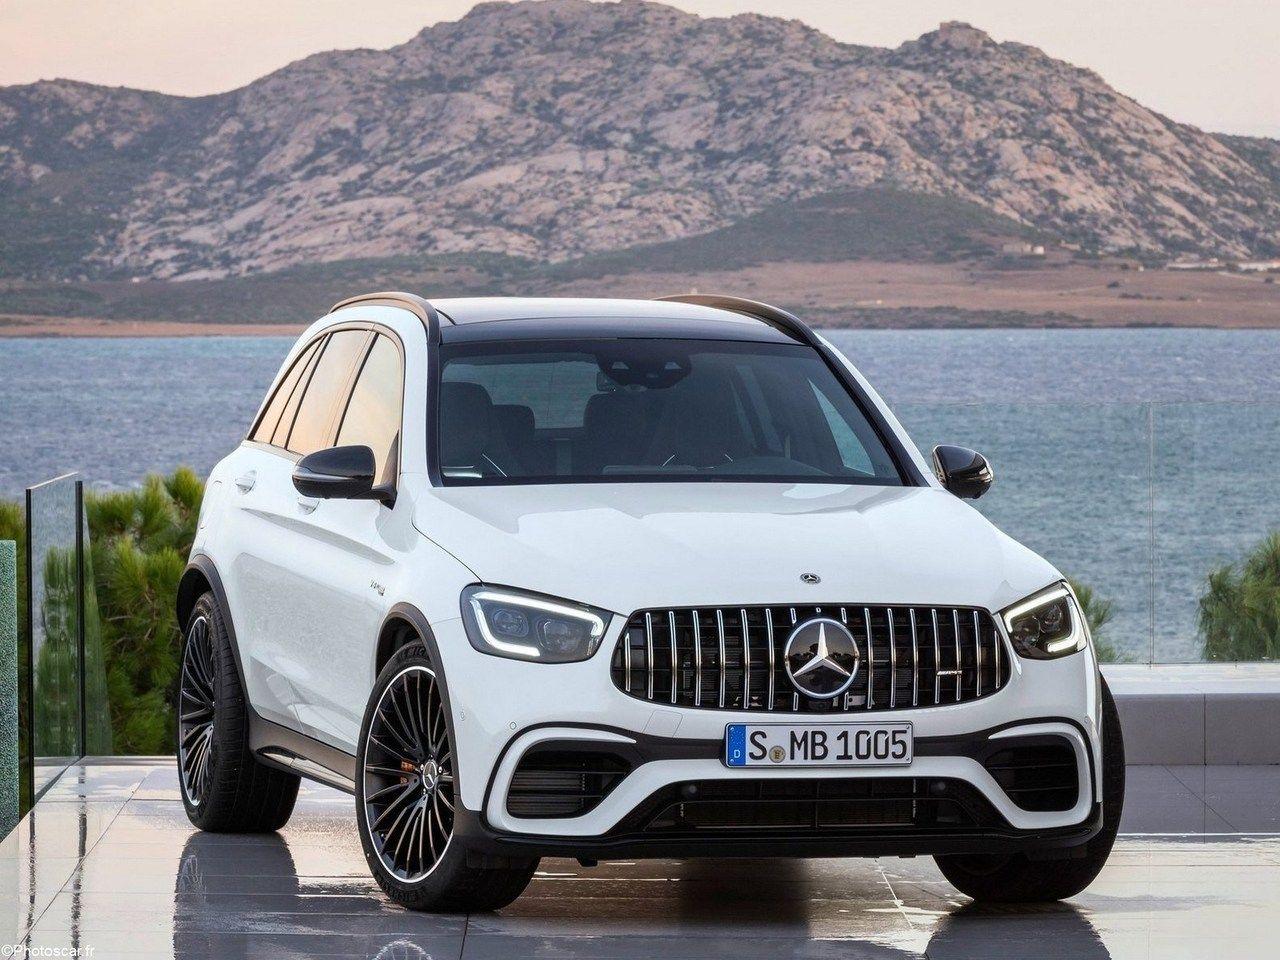 Mercedes Amg Glc 63 S 2020 Un Suv Alliant Sport Et Dynamisme Via